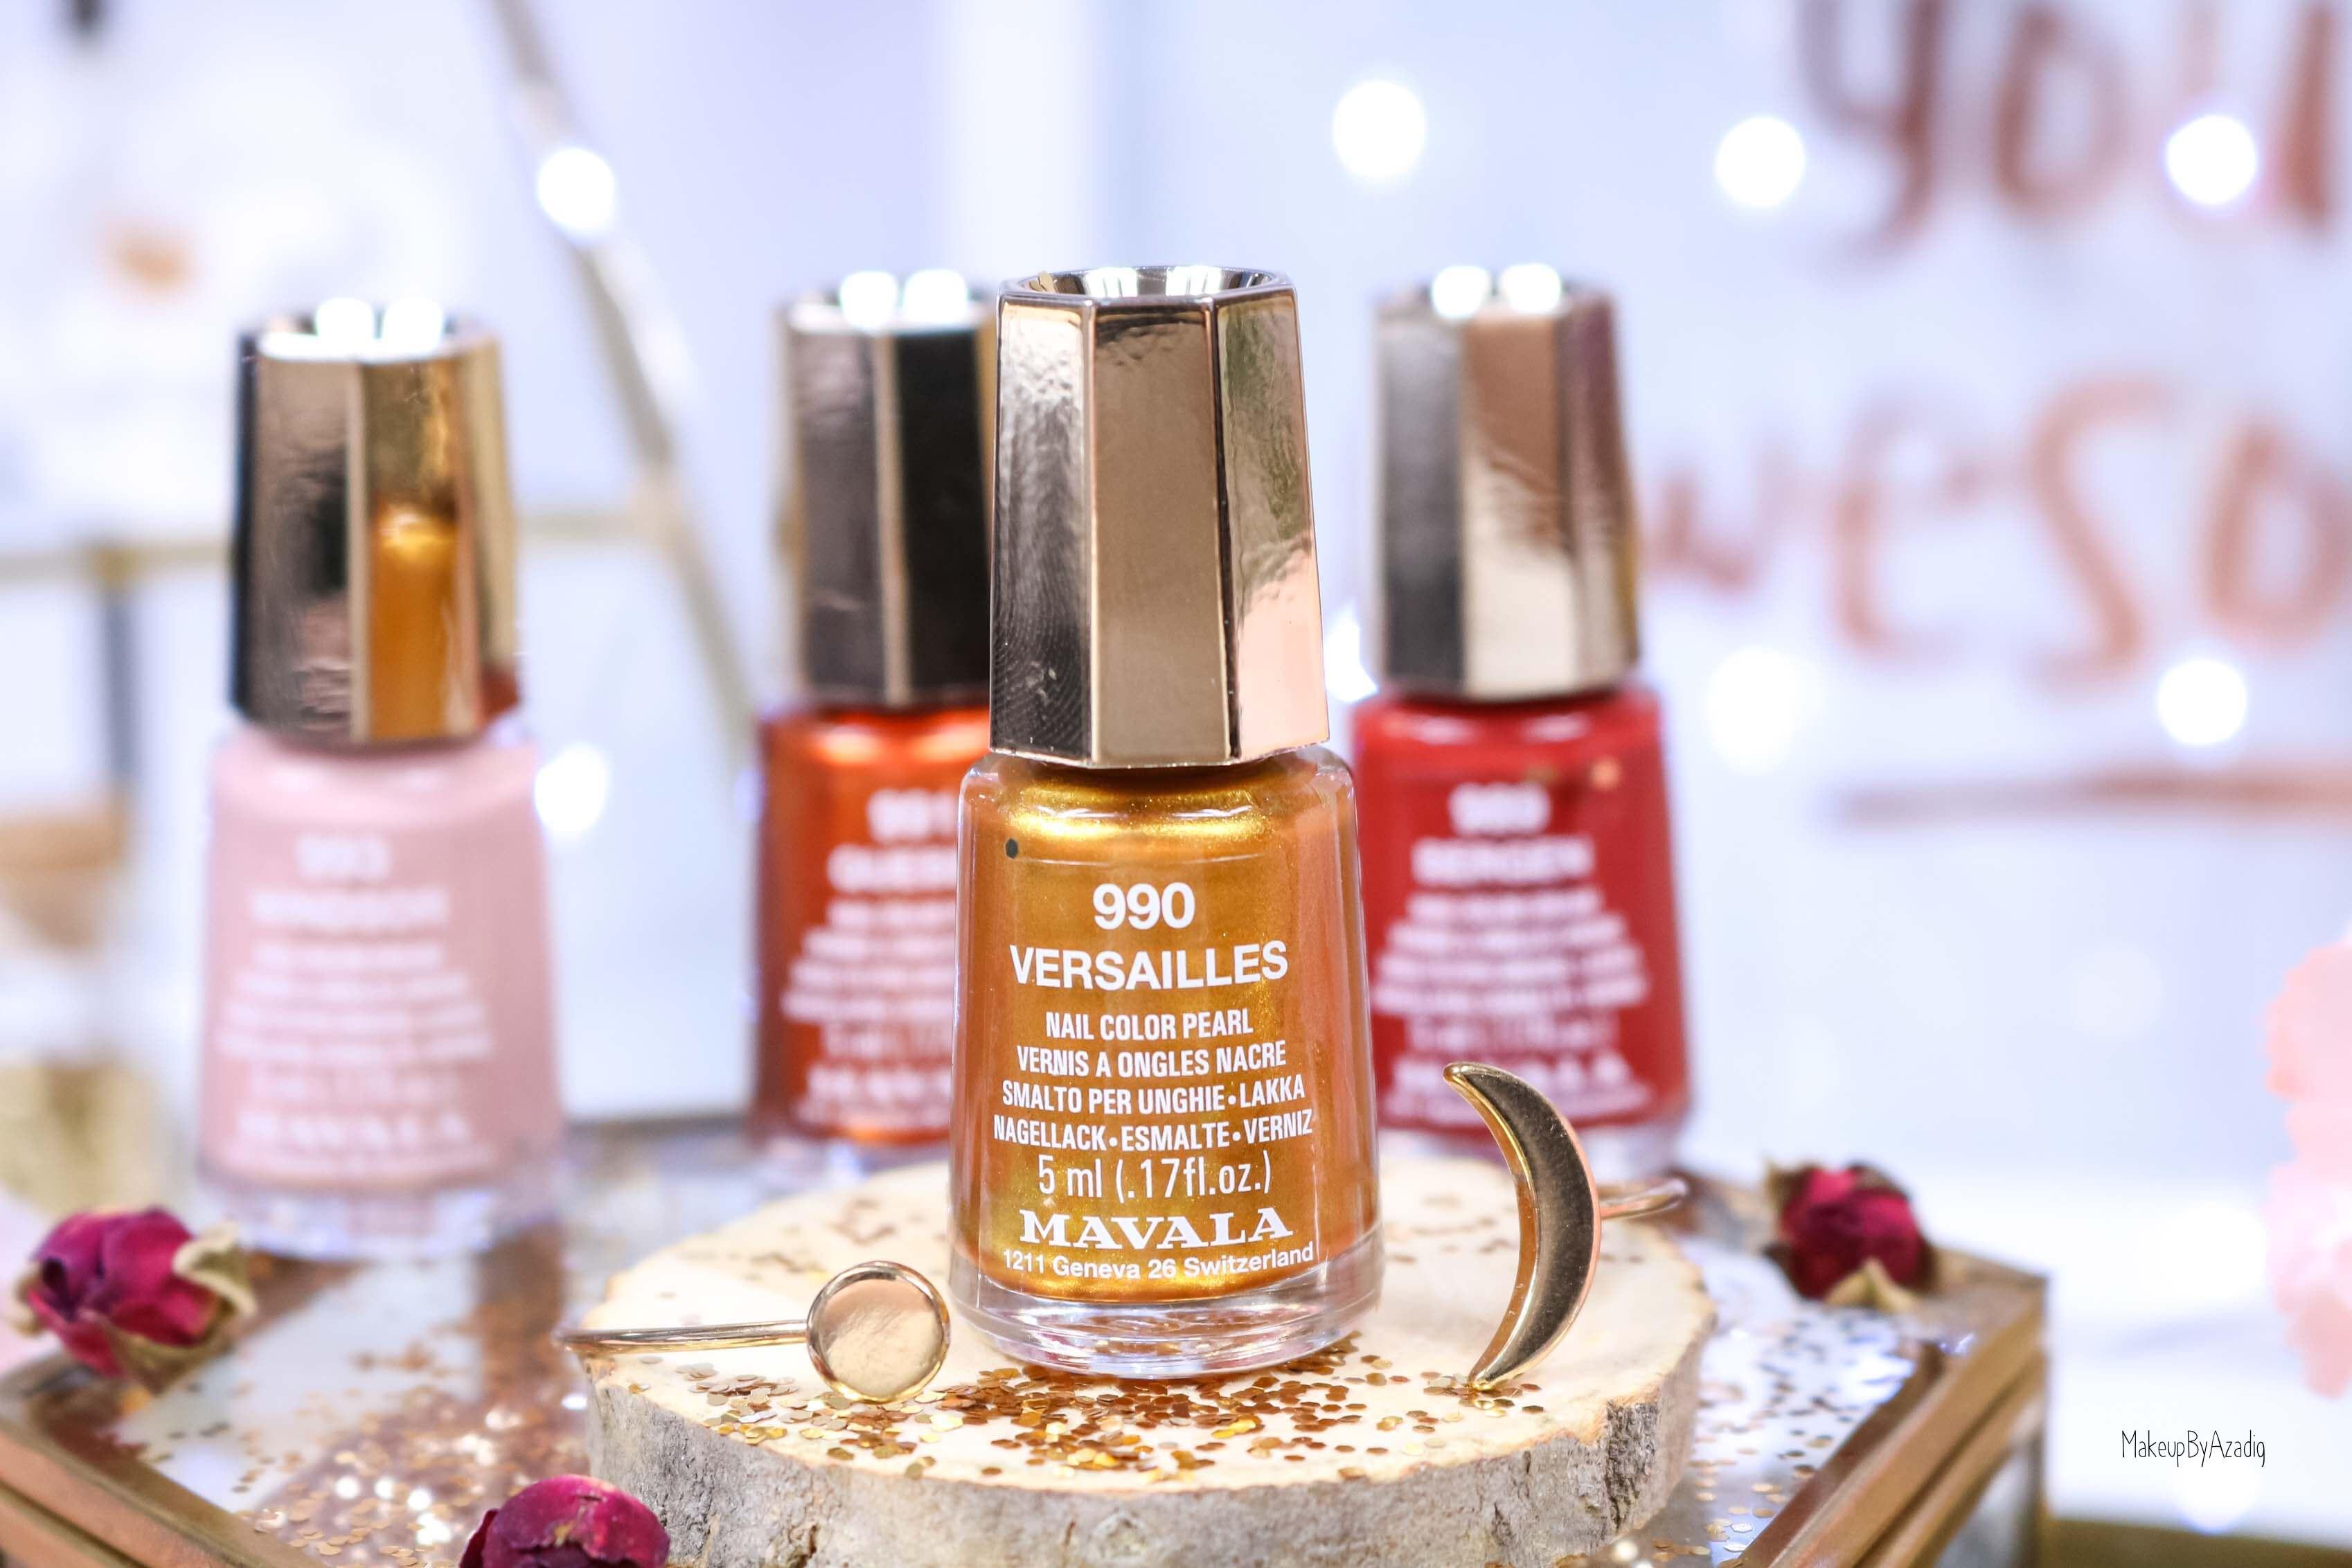 revue-collection-vernis-mavala-nails-heritage-chic-bordeaux-cuivre-metallique-gold-rouge-makeupbyazadig-swatch-avis-prix-versailles